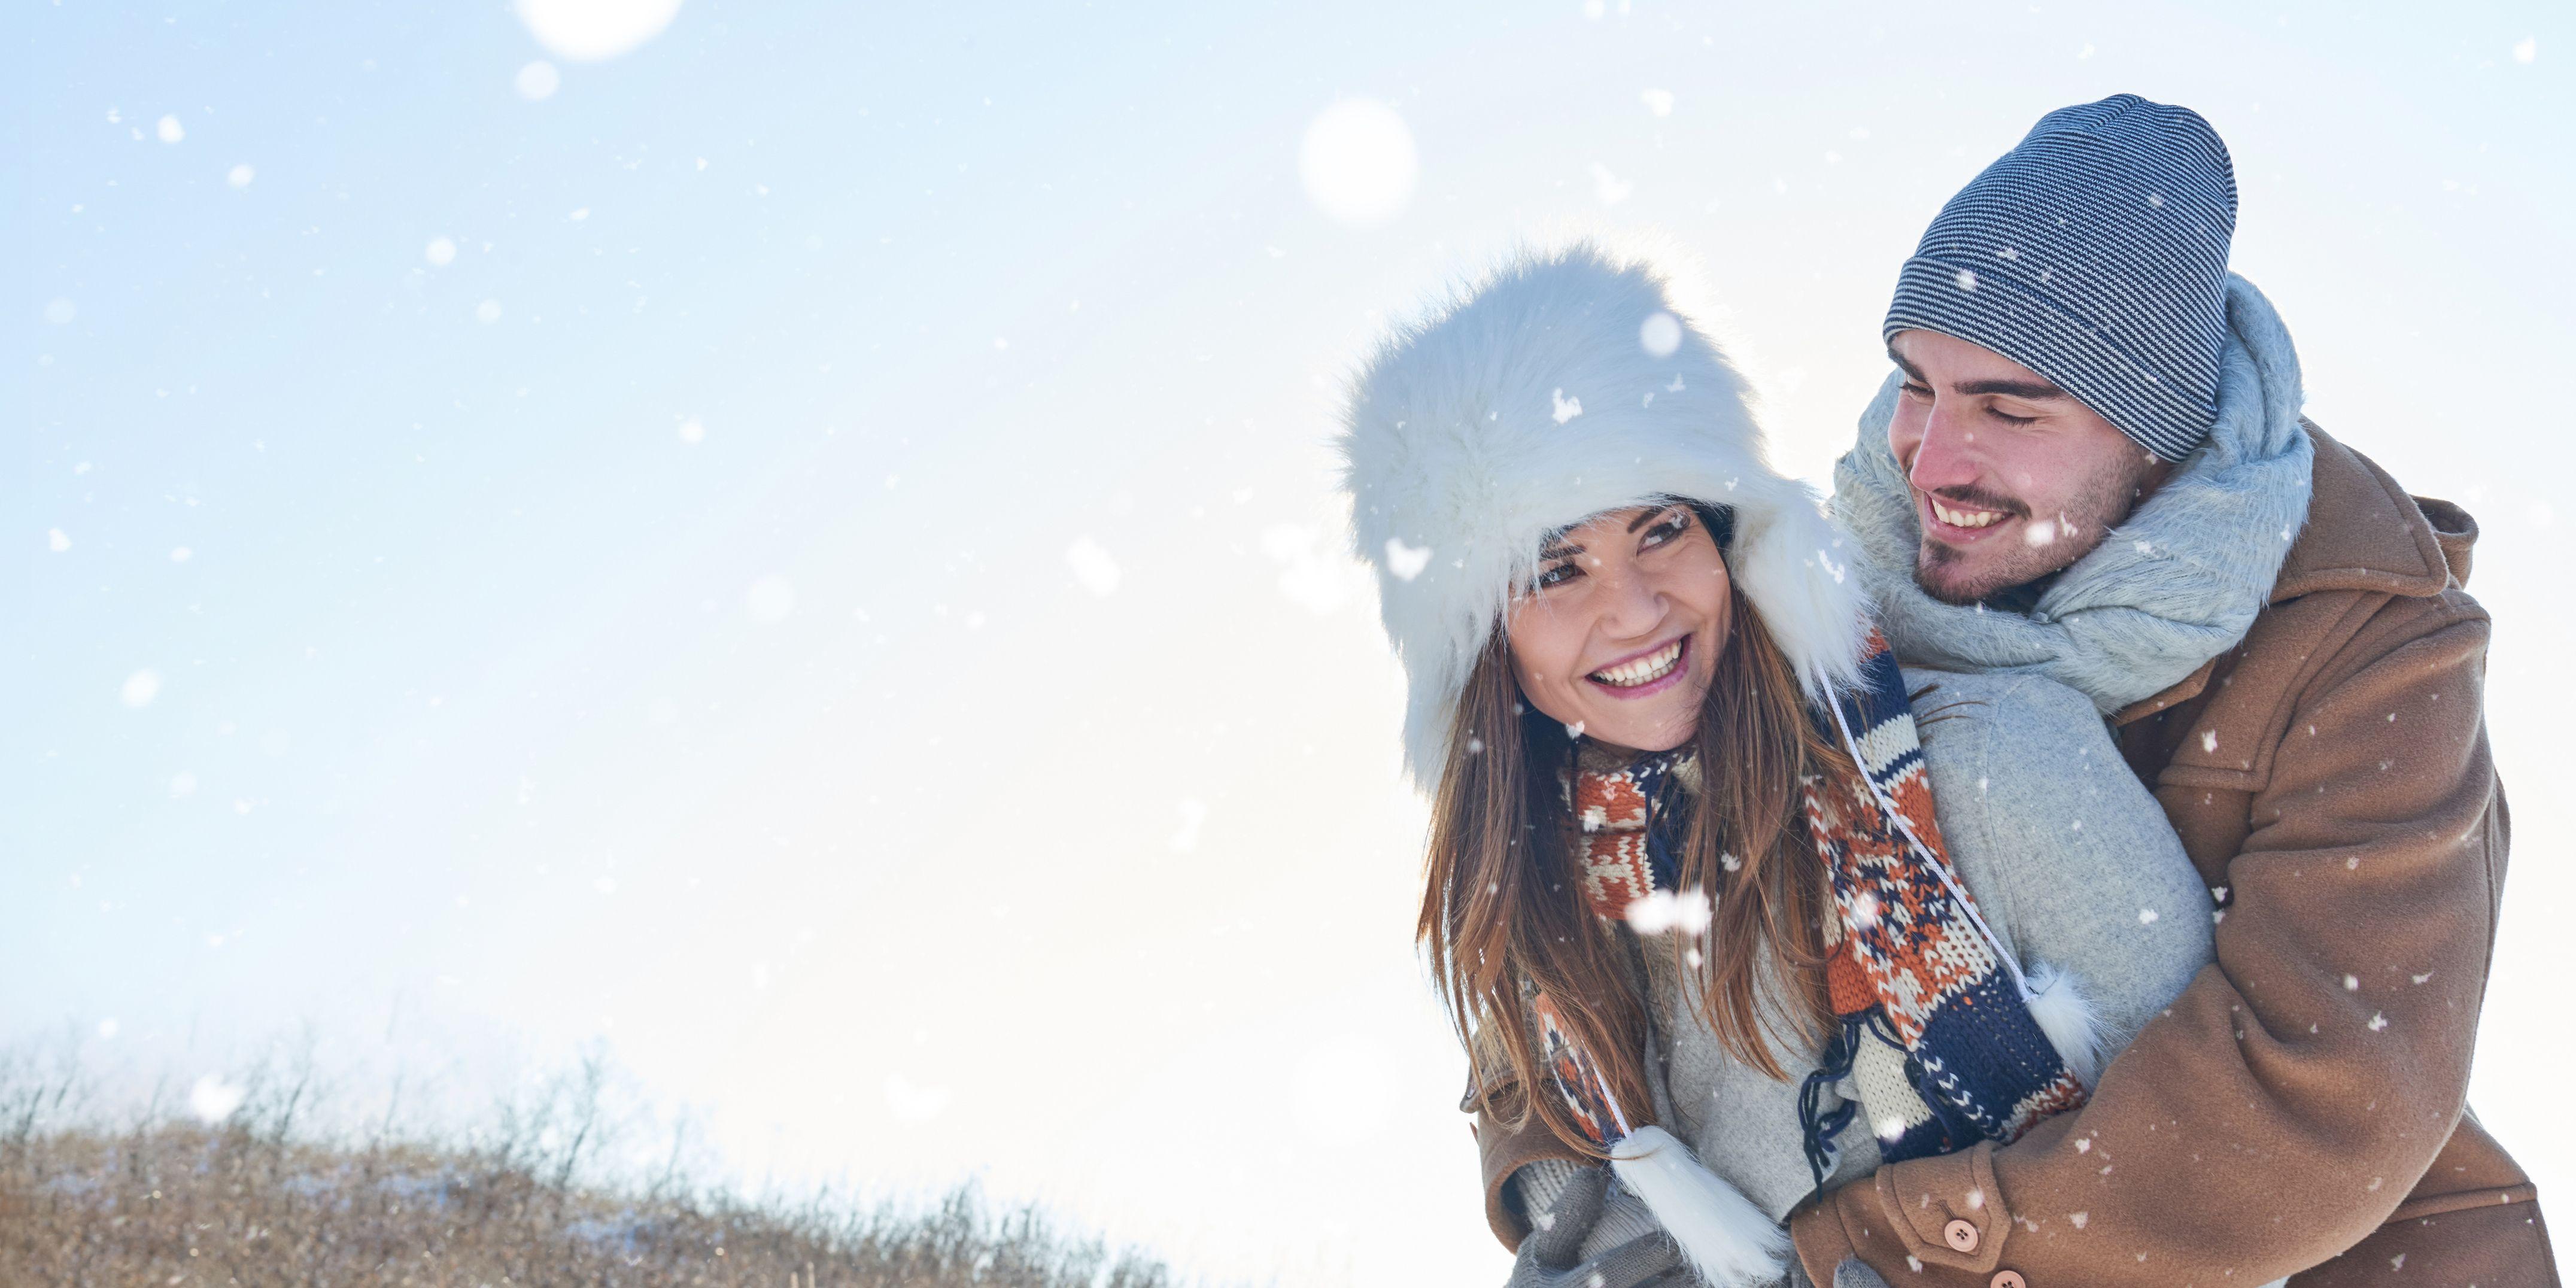 Boyfriend Embracing Cheerful Girlfriend Against Clear Sky During Snowfall